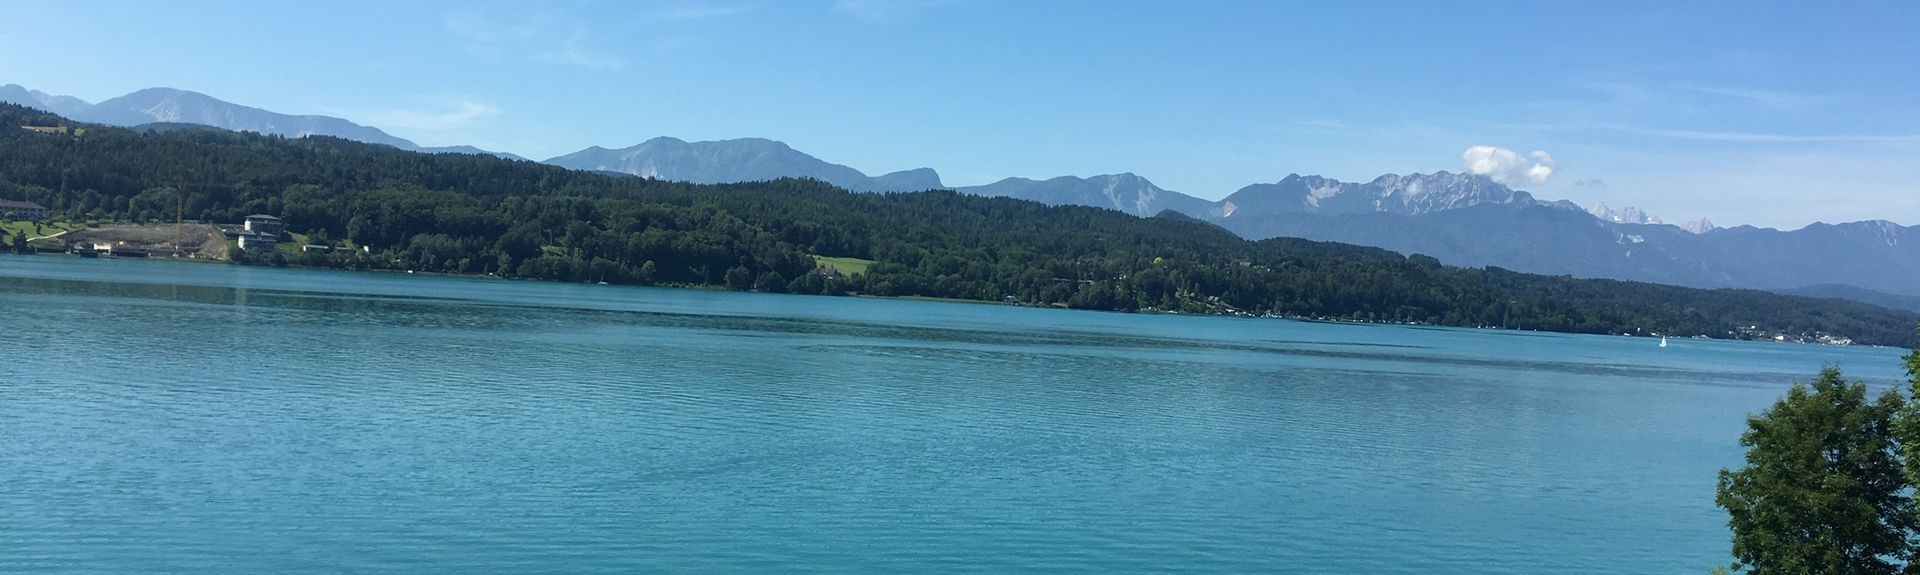 Villacher Alpenarena, Villach, Karinthië, Oostenrijk